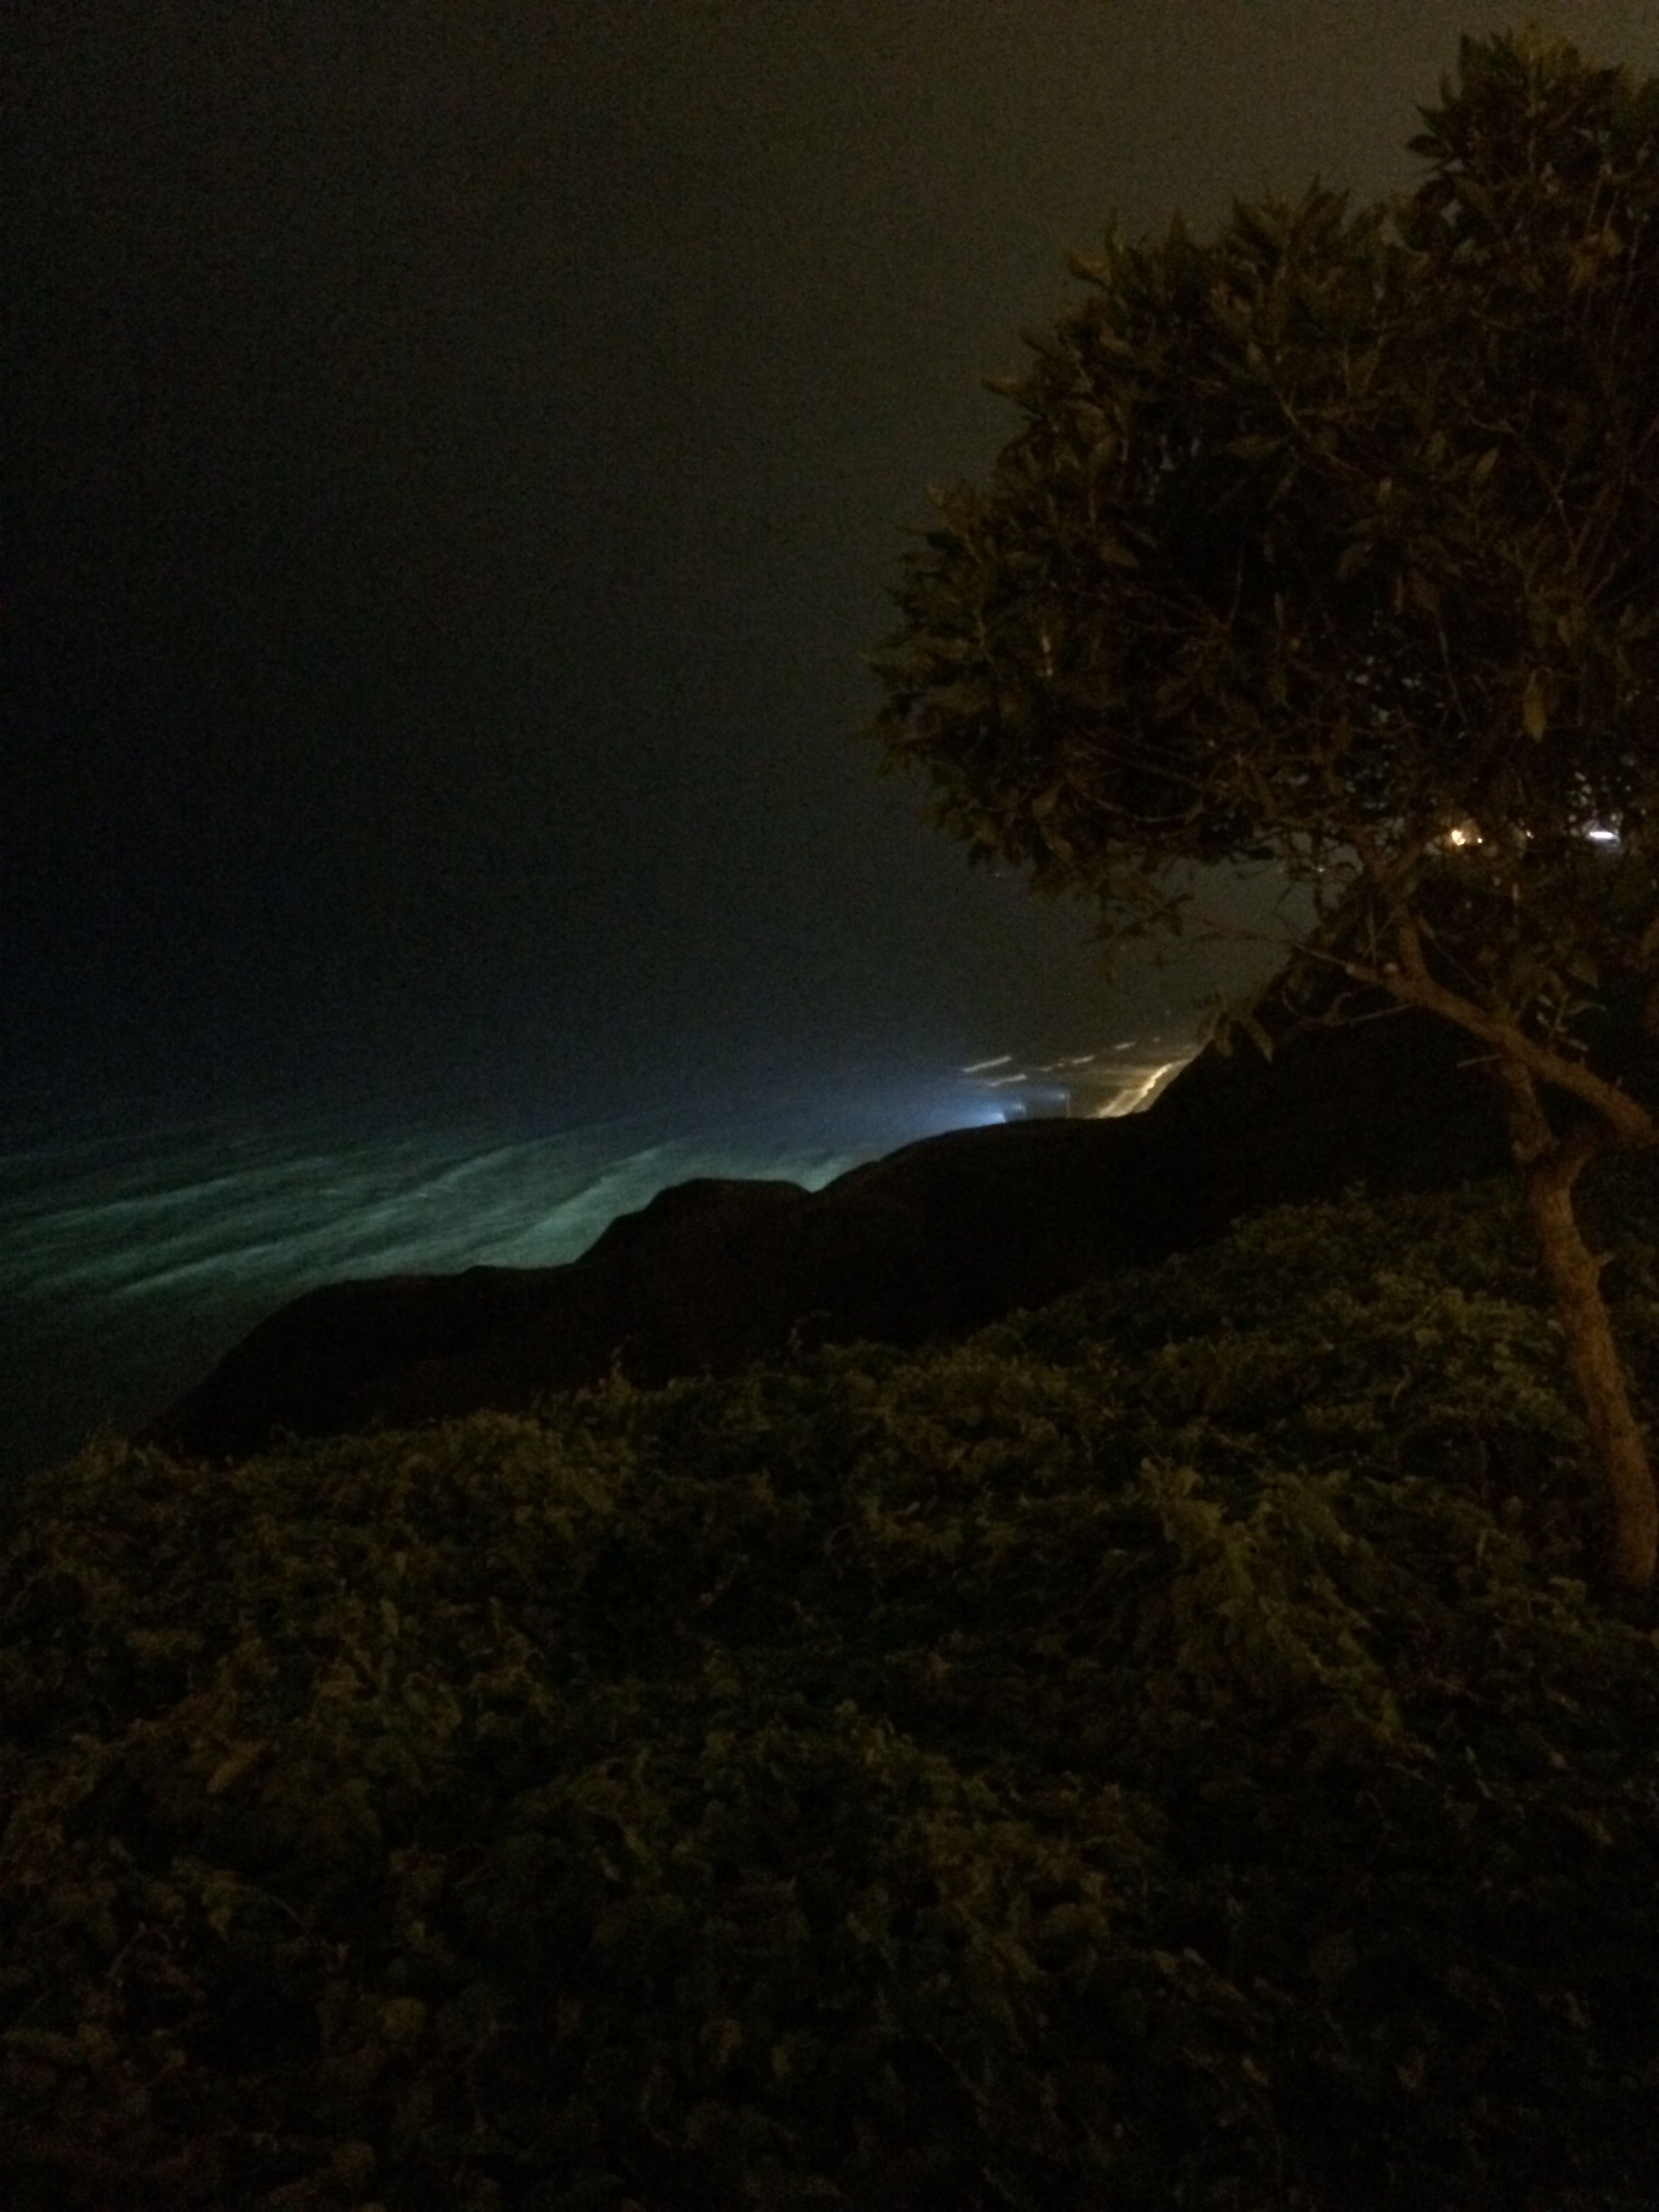 Hermosa vista nocturna de malecón de Miraflores, Lima.